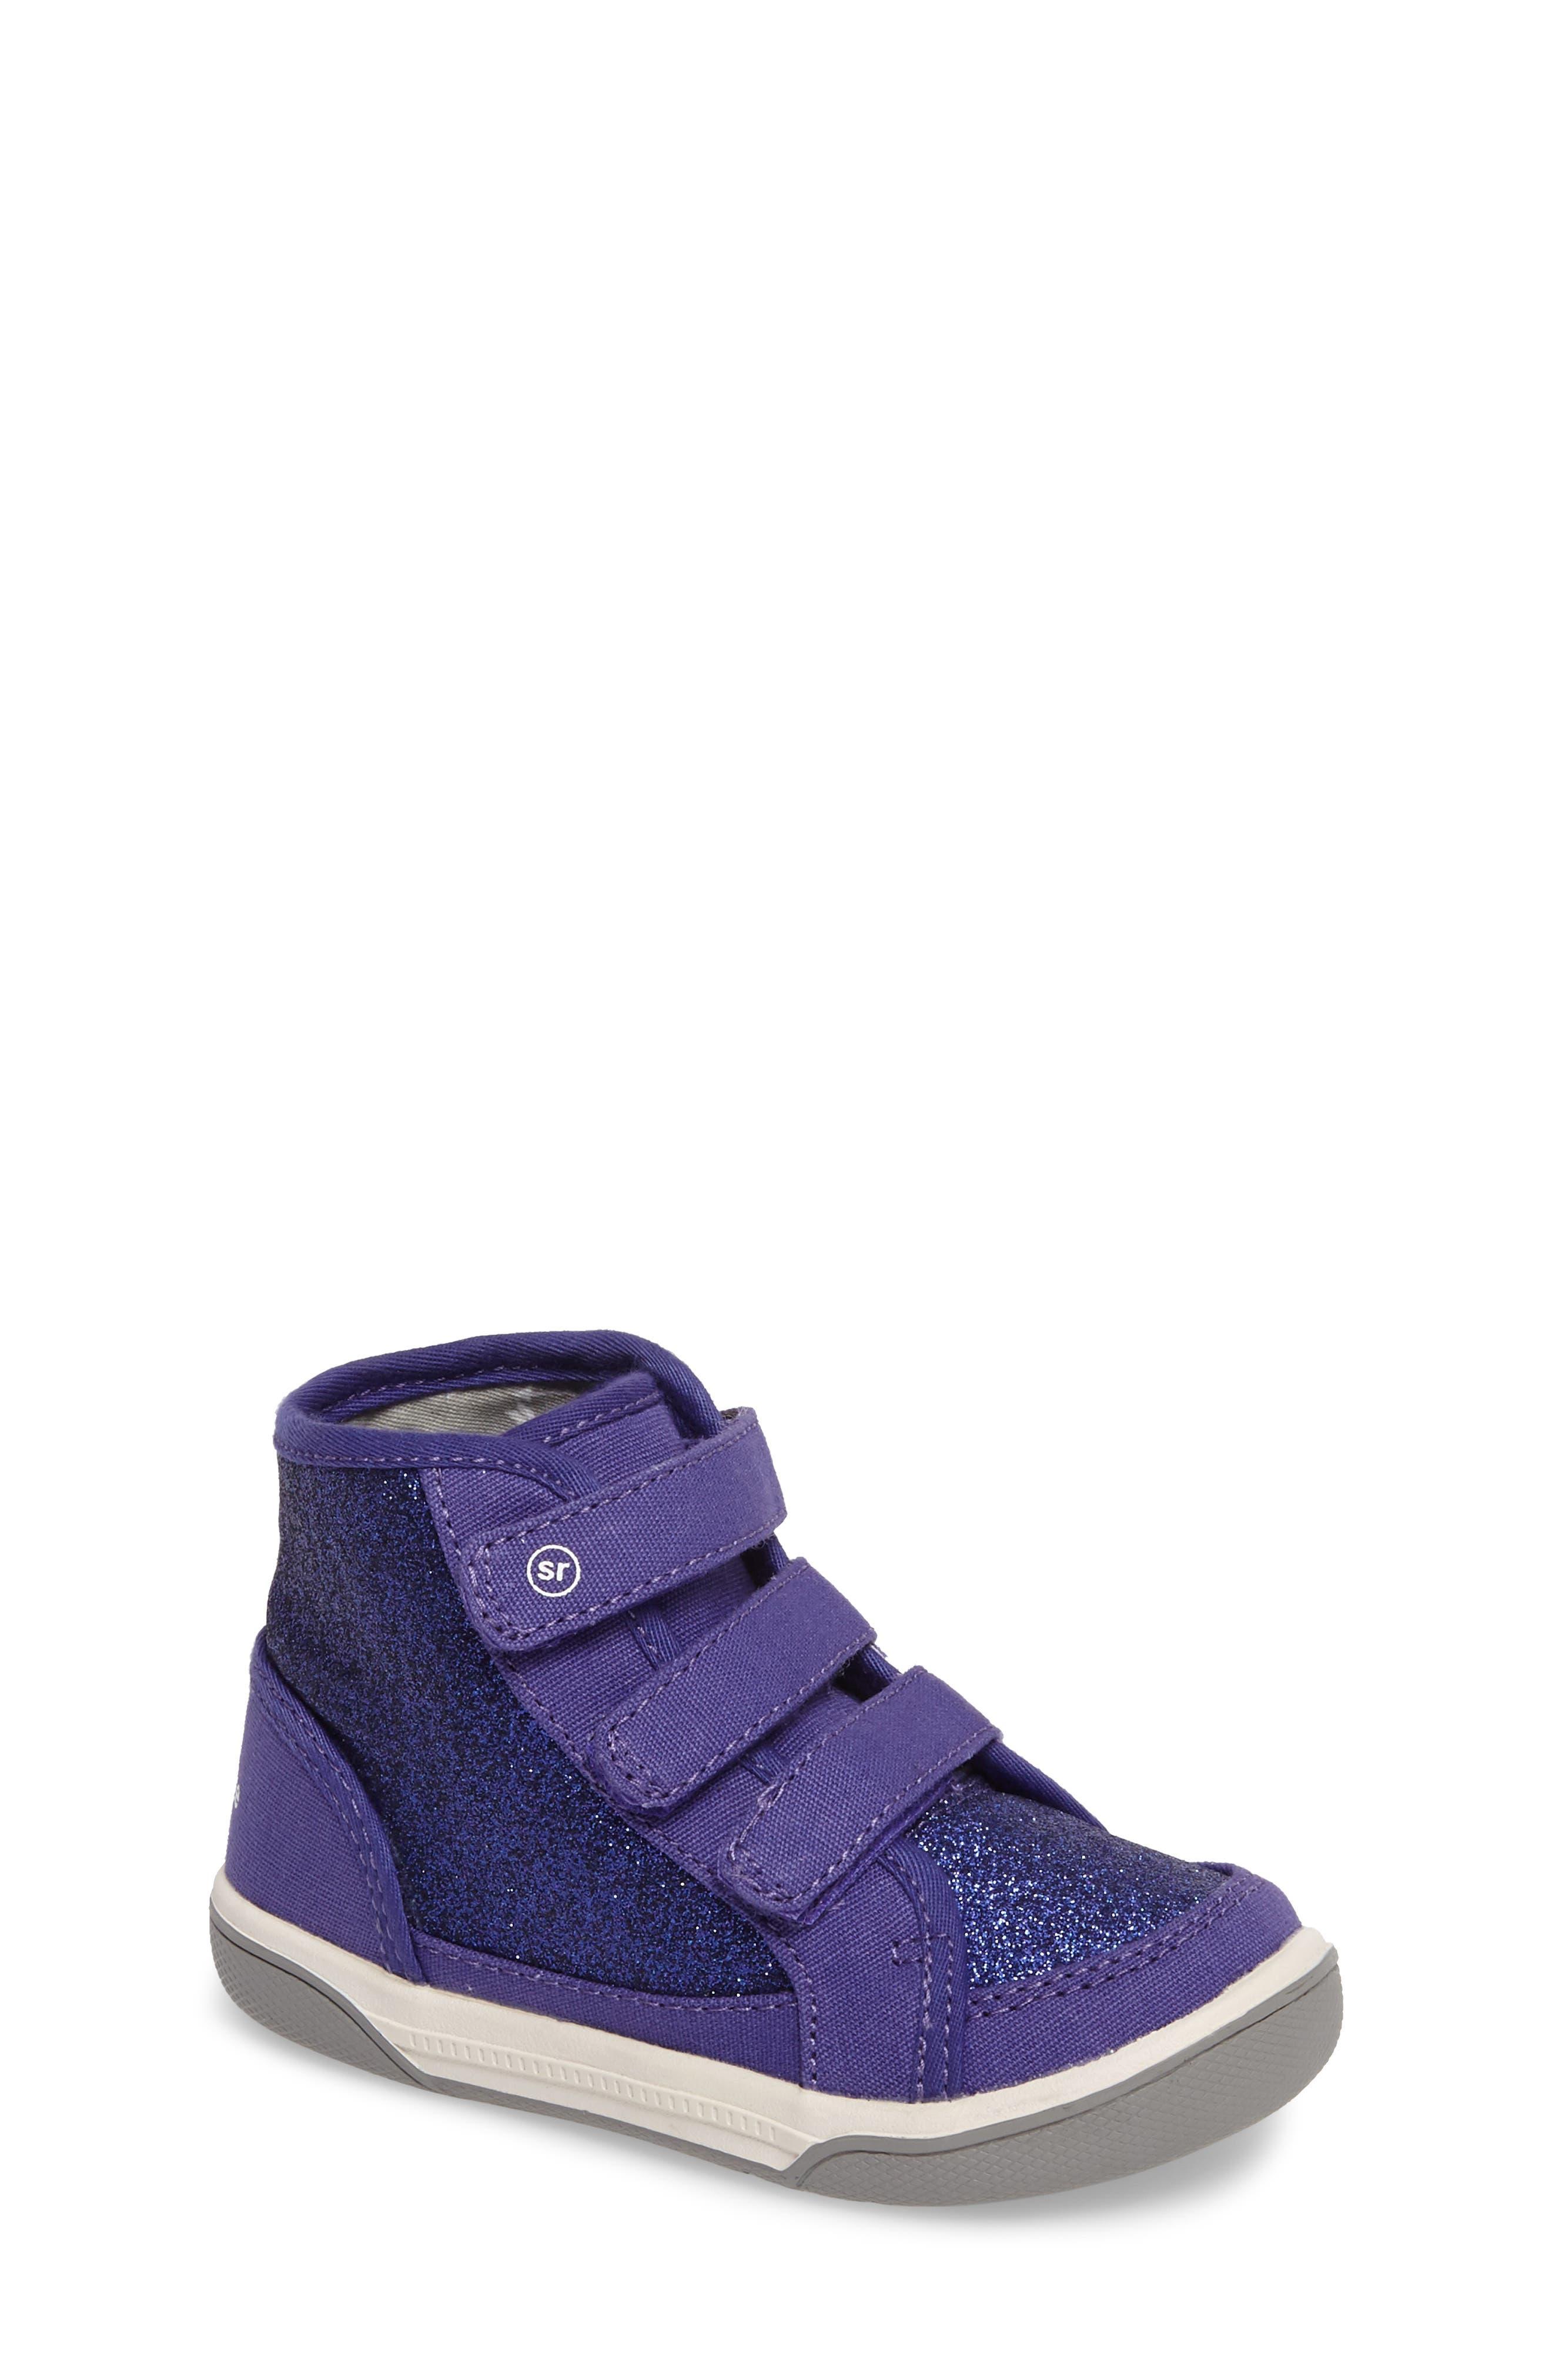 Ellis Glitter High Top Sneaker,                         Main,                         color, 500